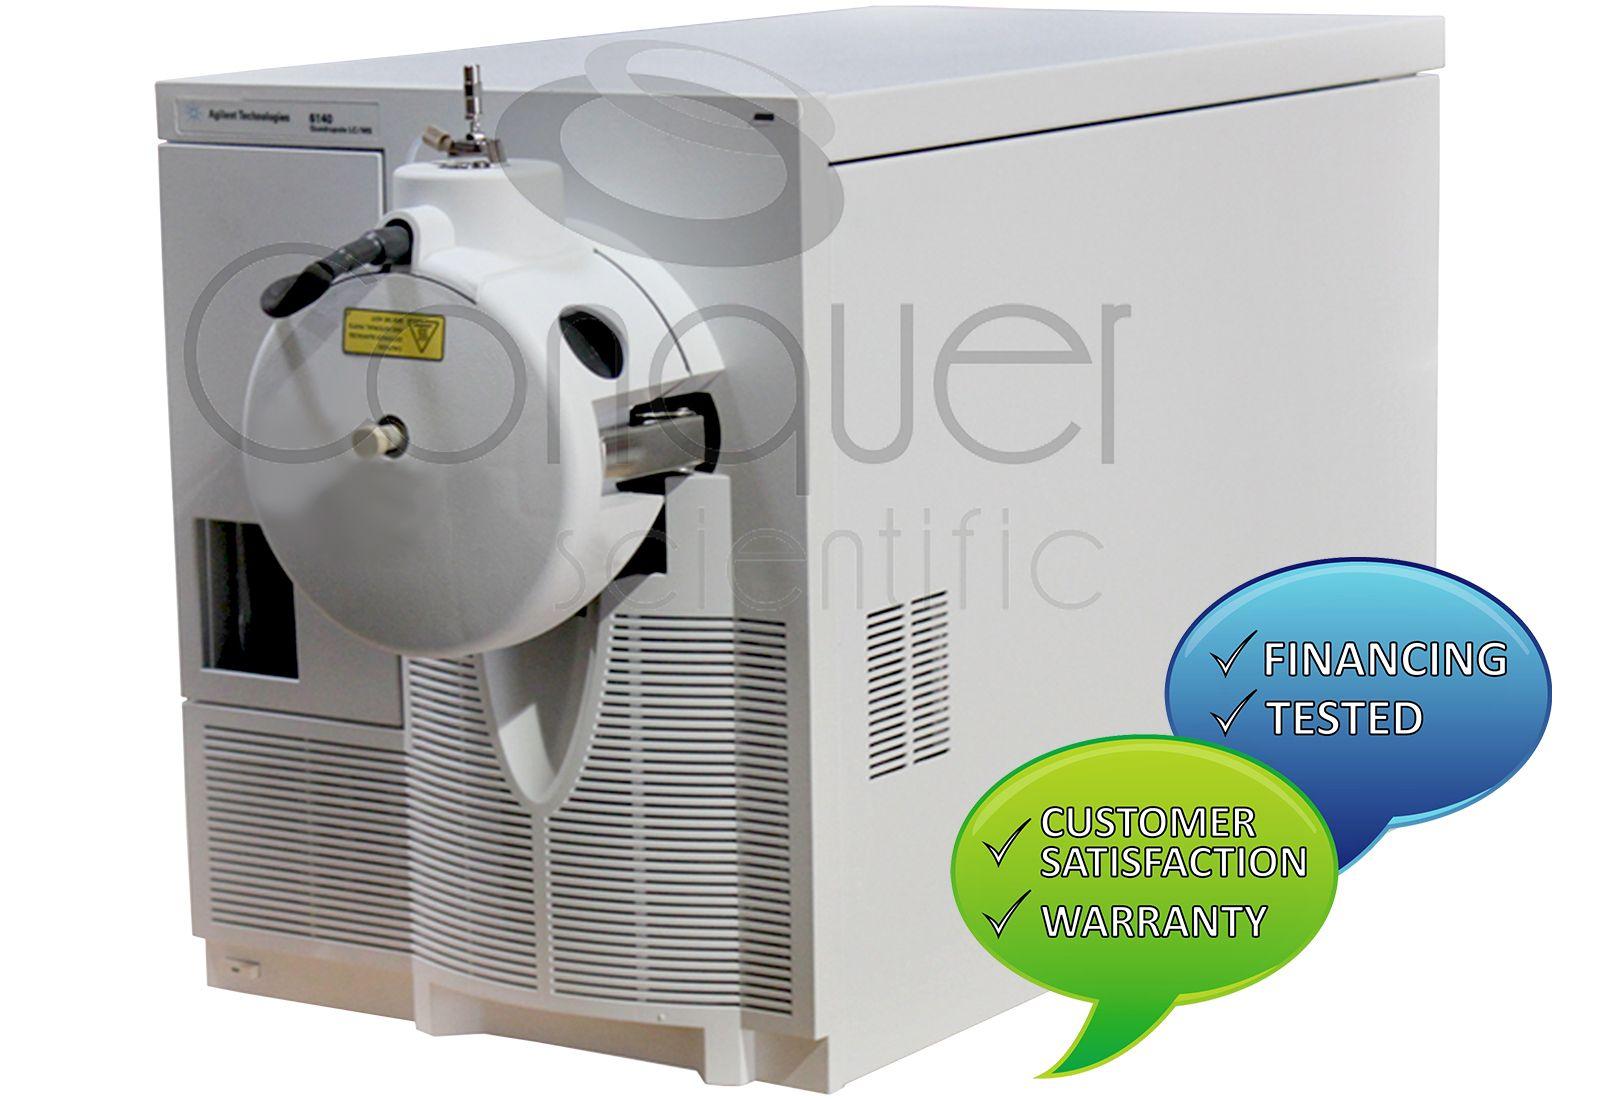 Agilent 6140 Series Quadrupole LCMS / LC-MS / MSD / Mass Spectrometer System